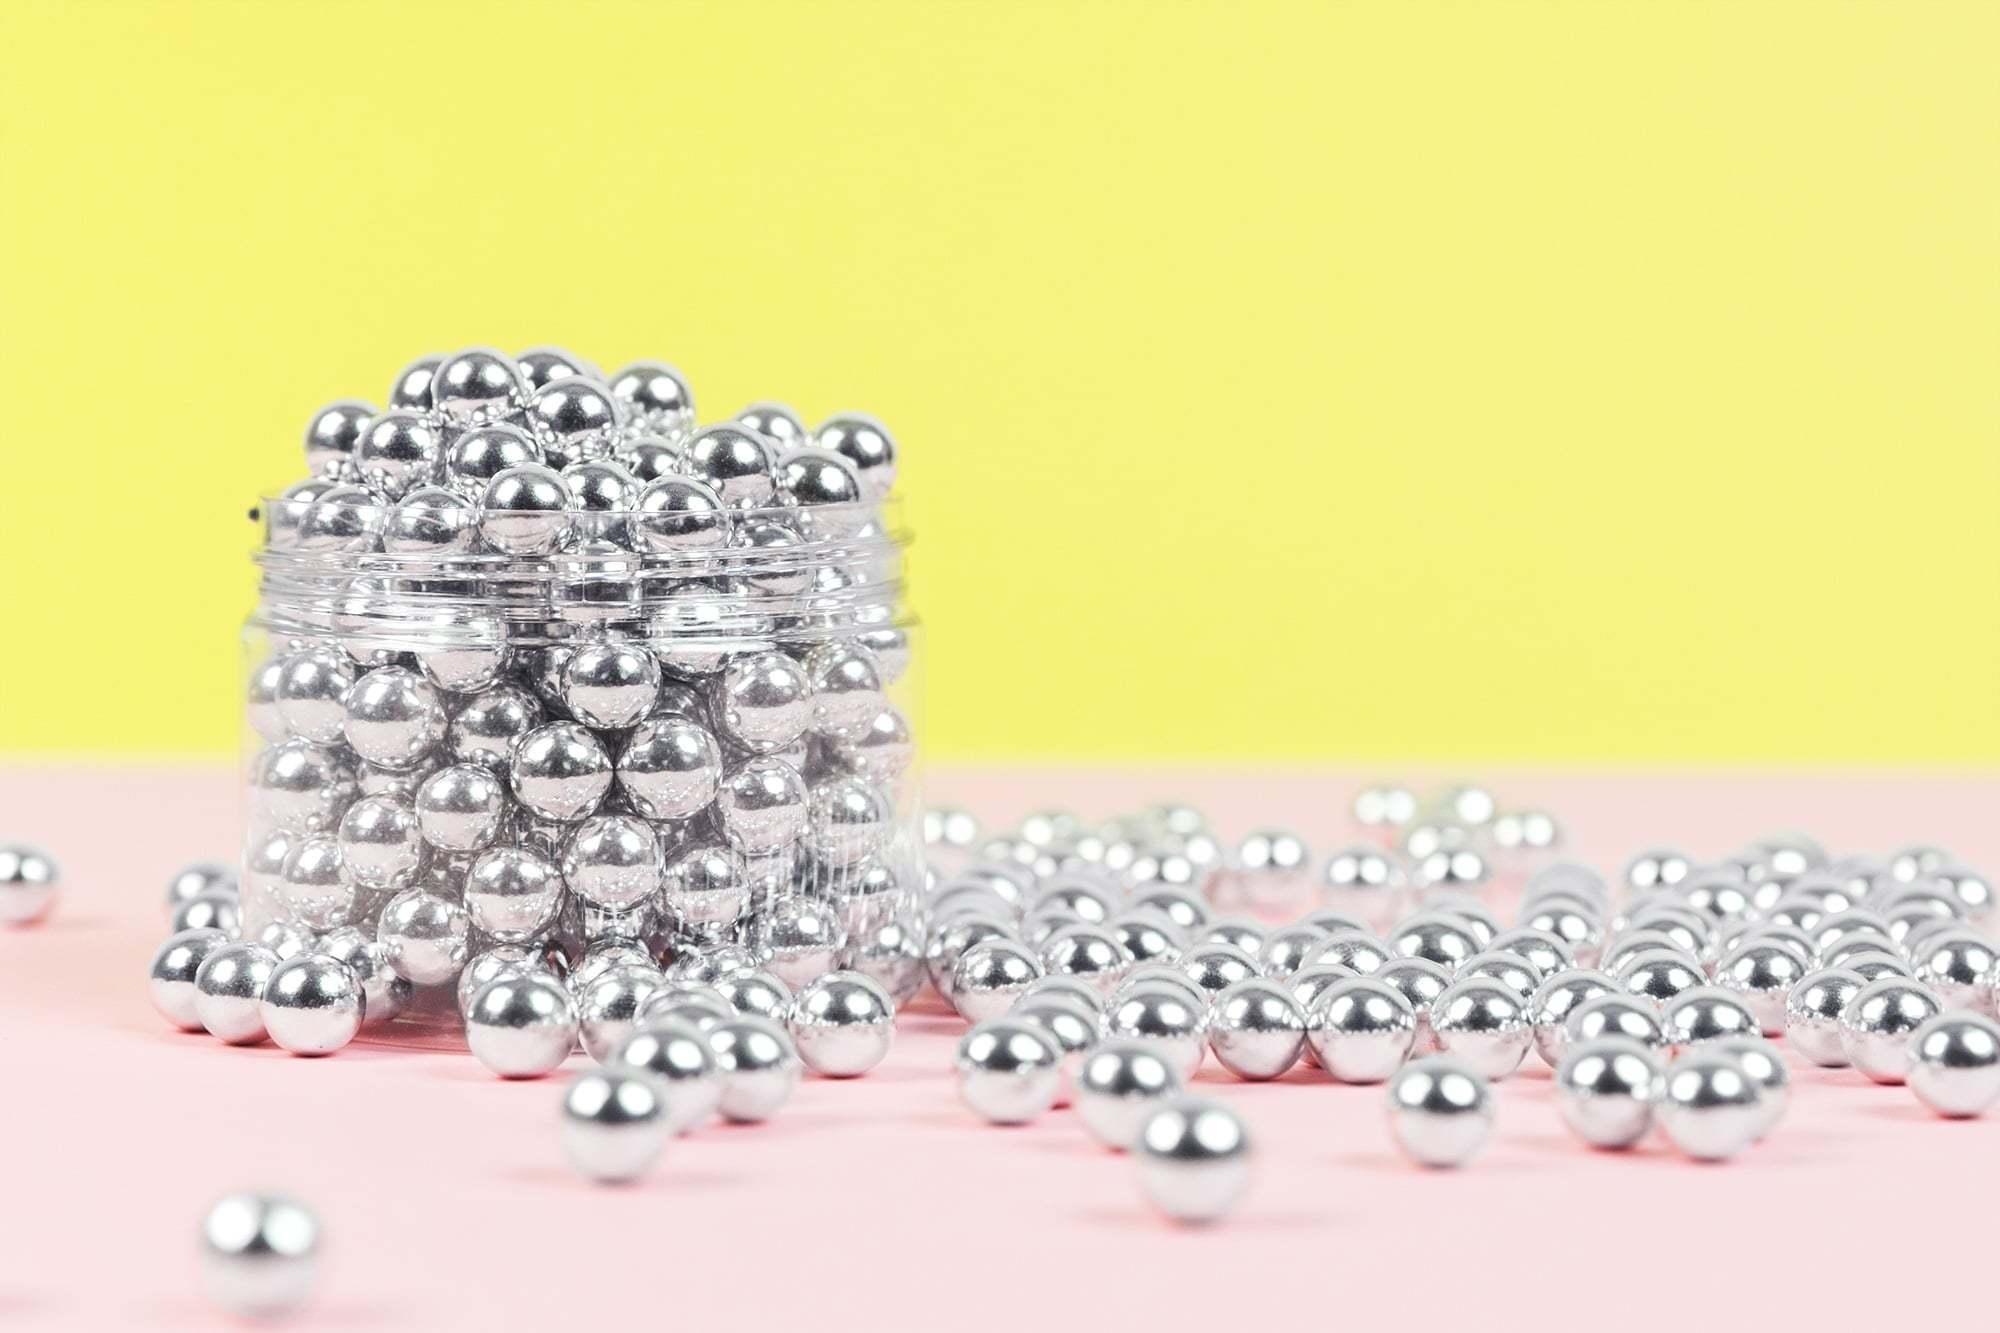 lieblingsstreusel-metallic-zuckerperlen-zuckerstreusel